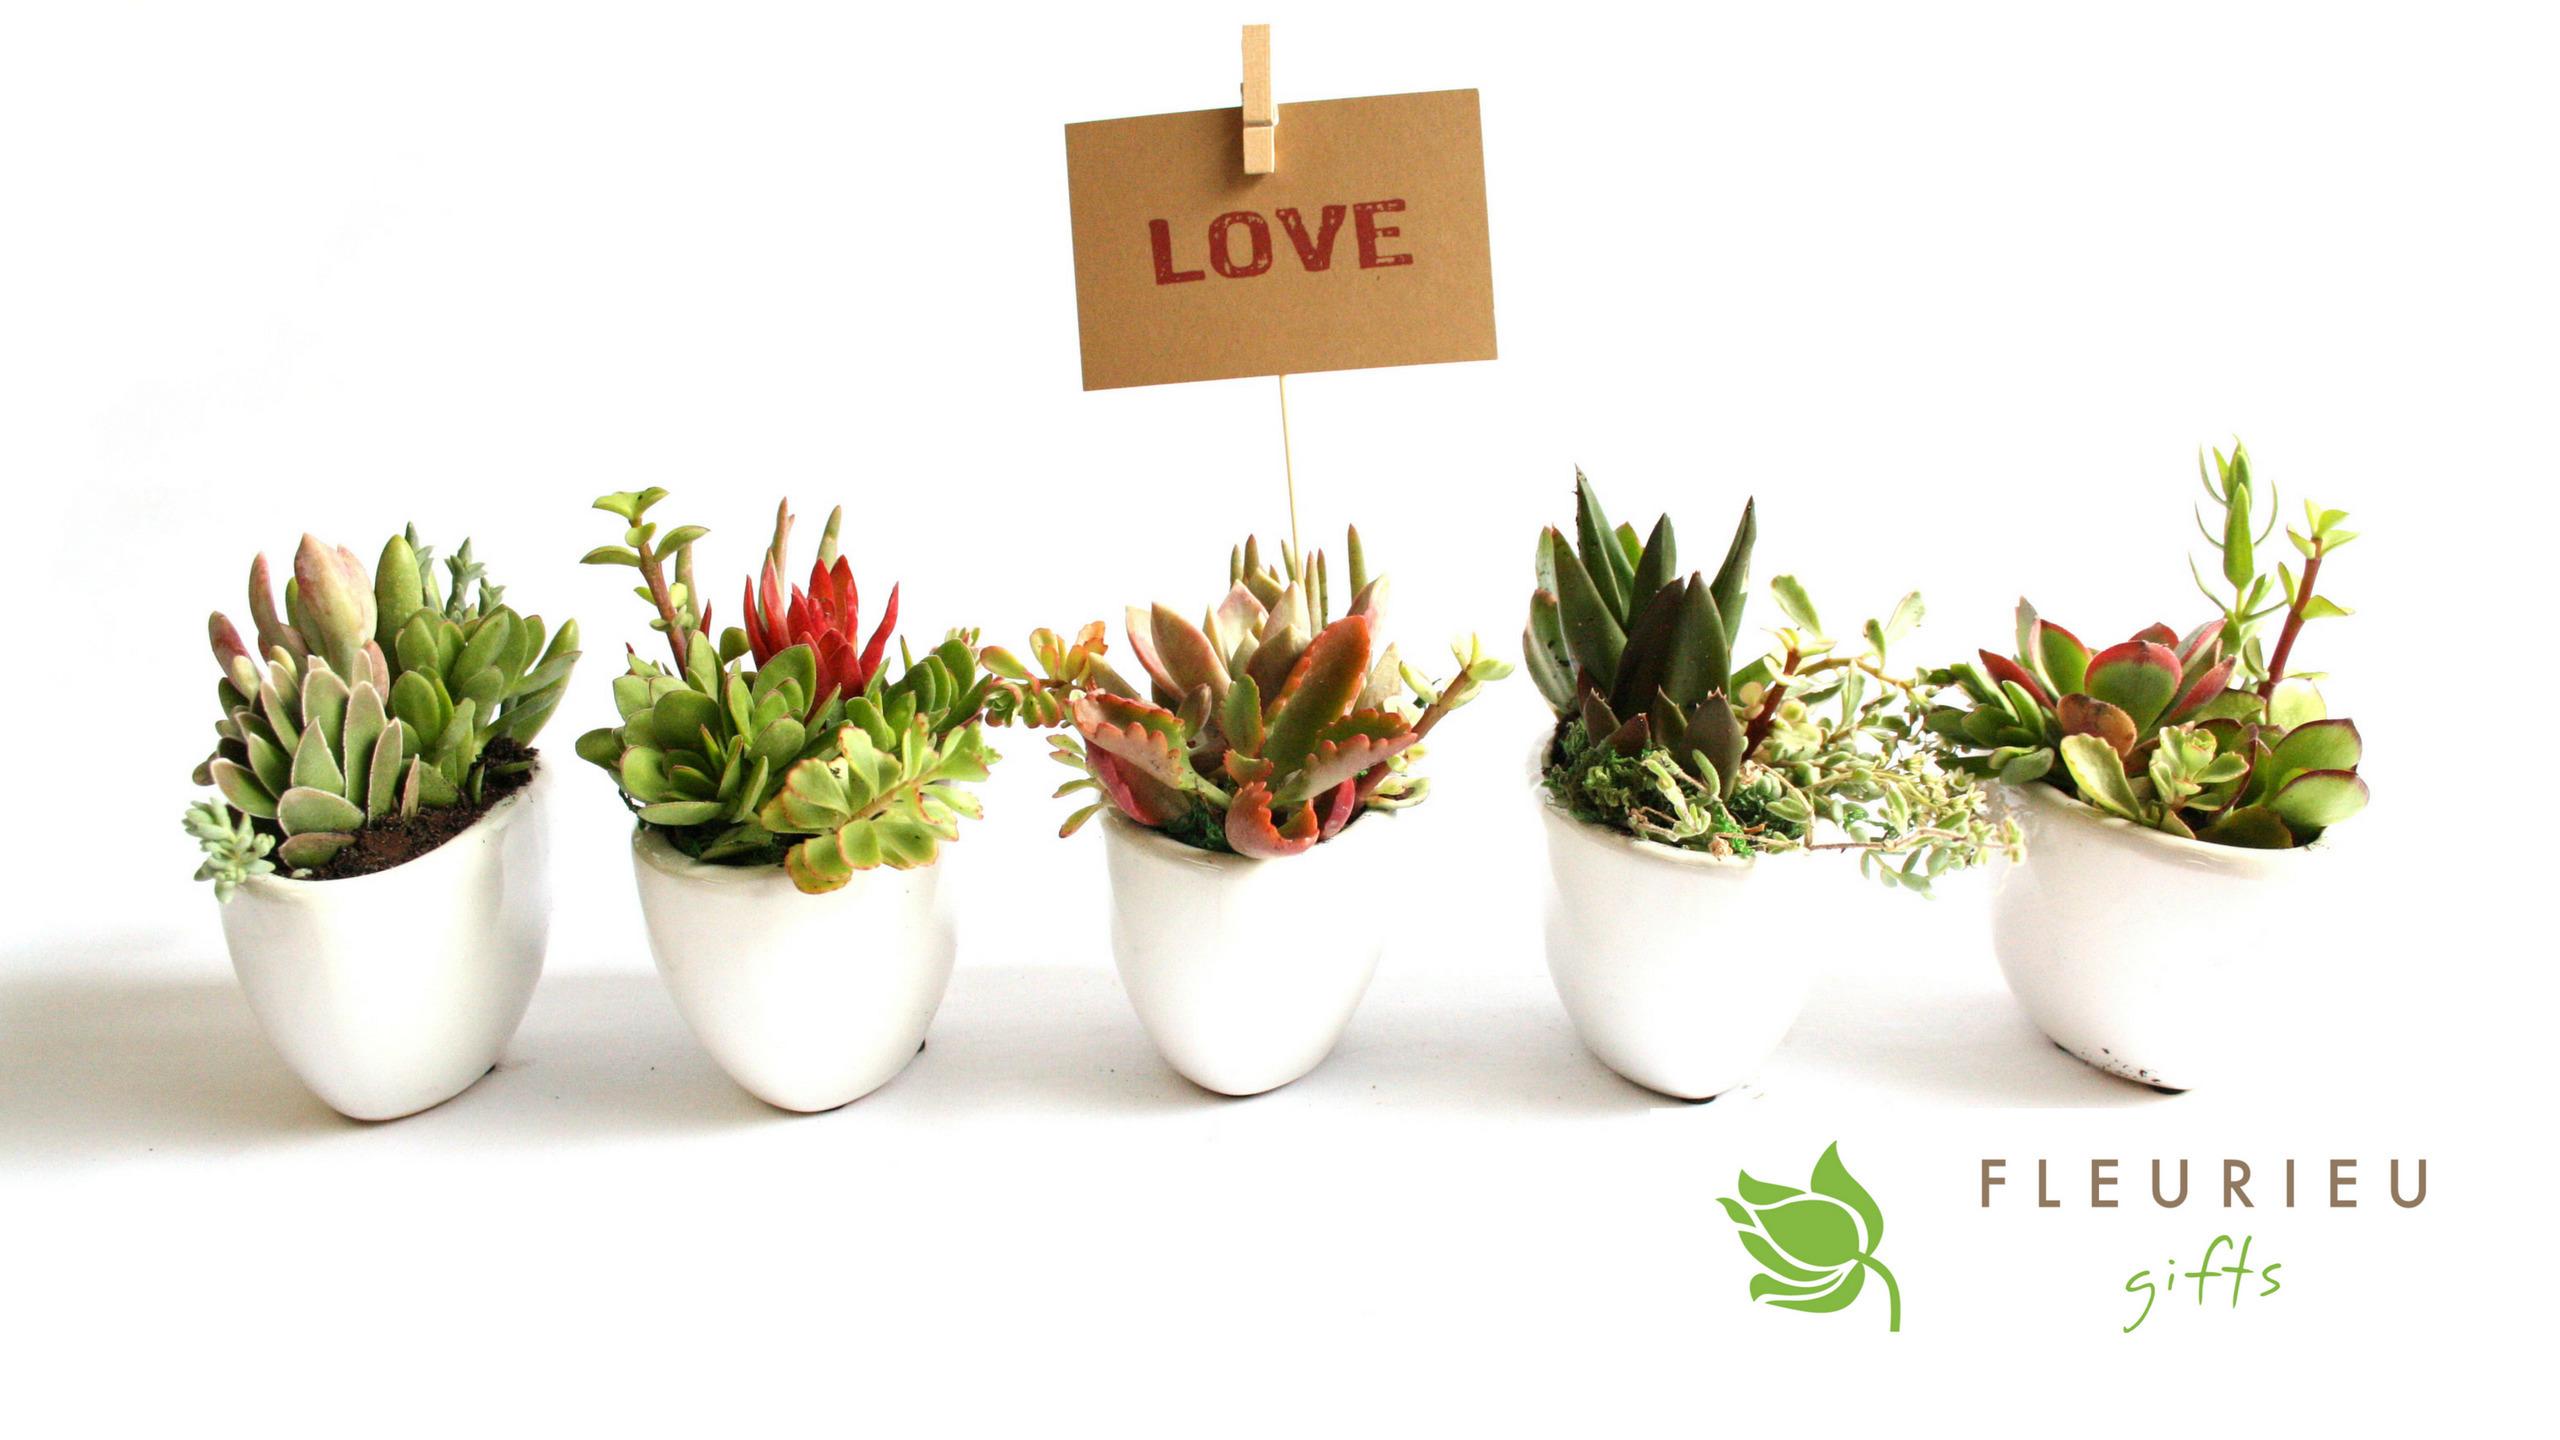 Fleurieu Gifts (@fleurieugifts) Cover Image